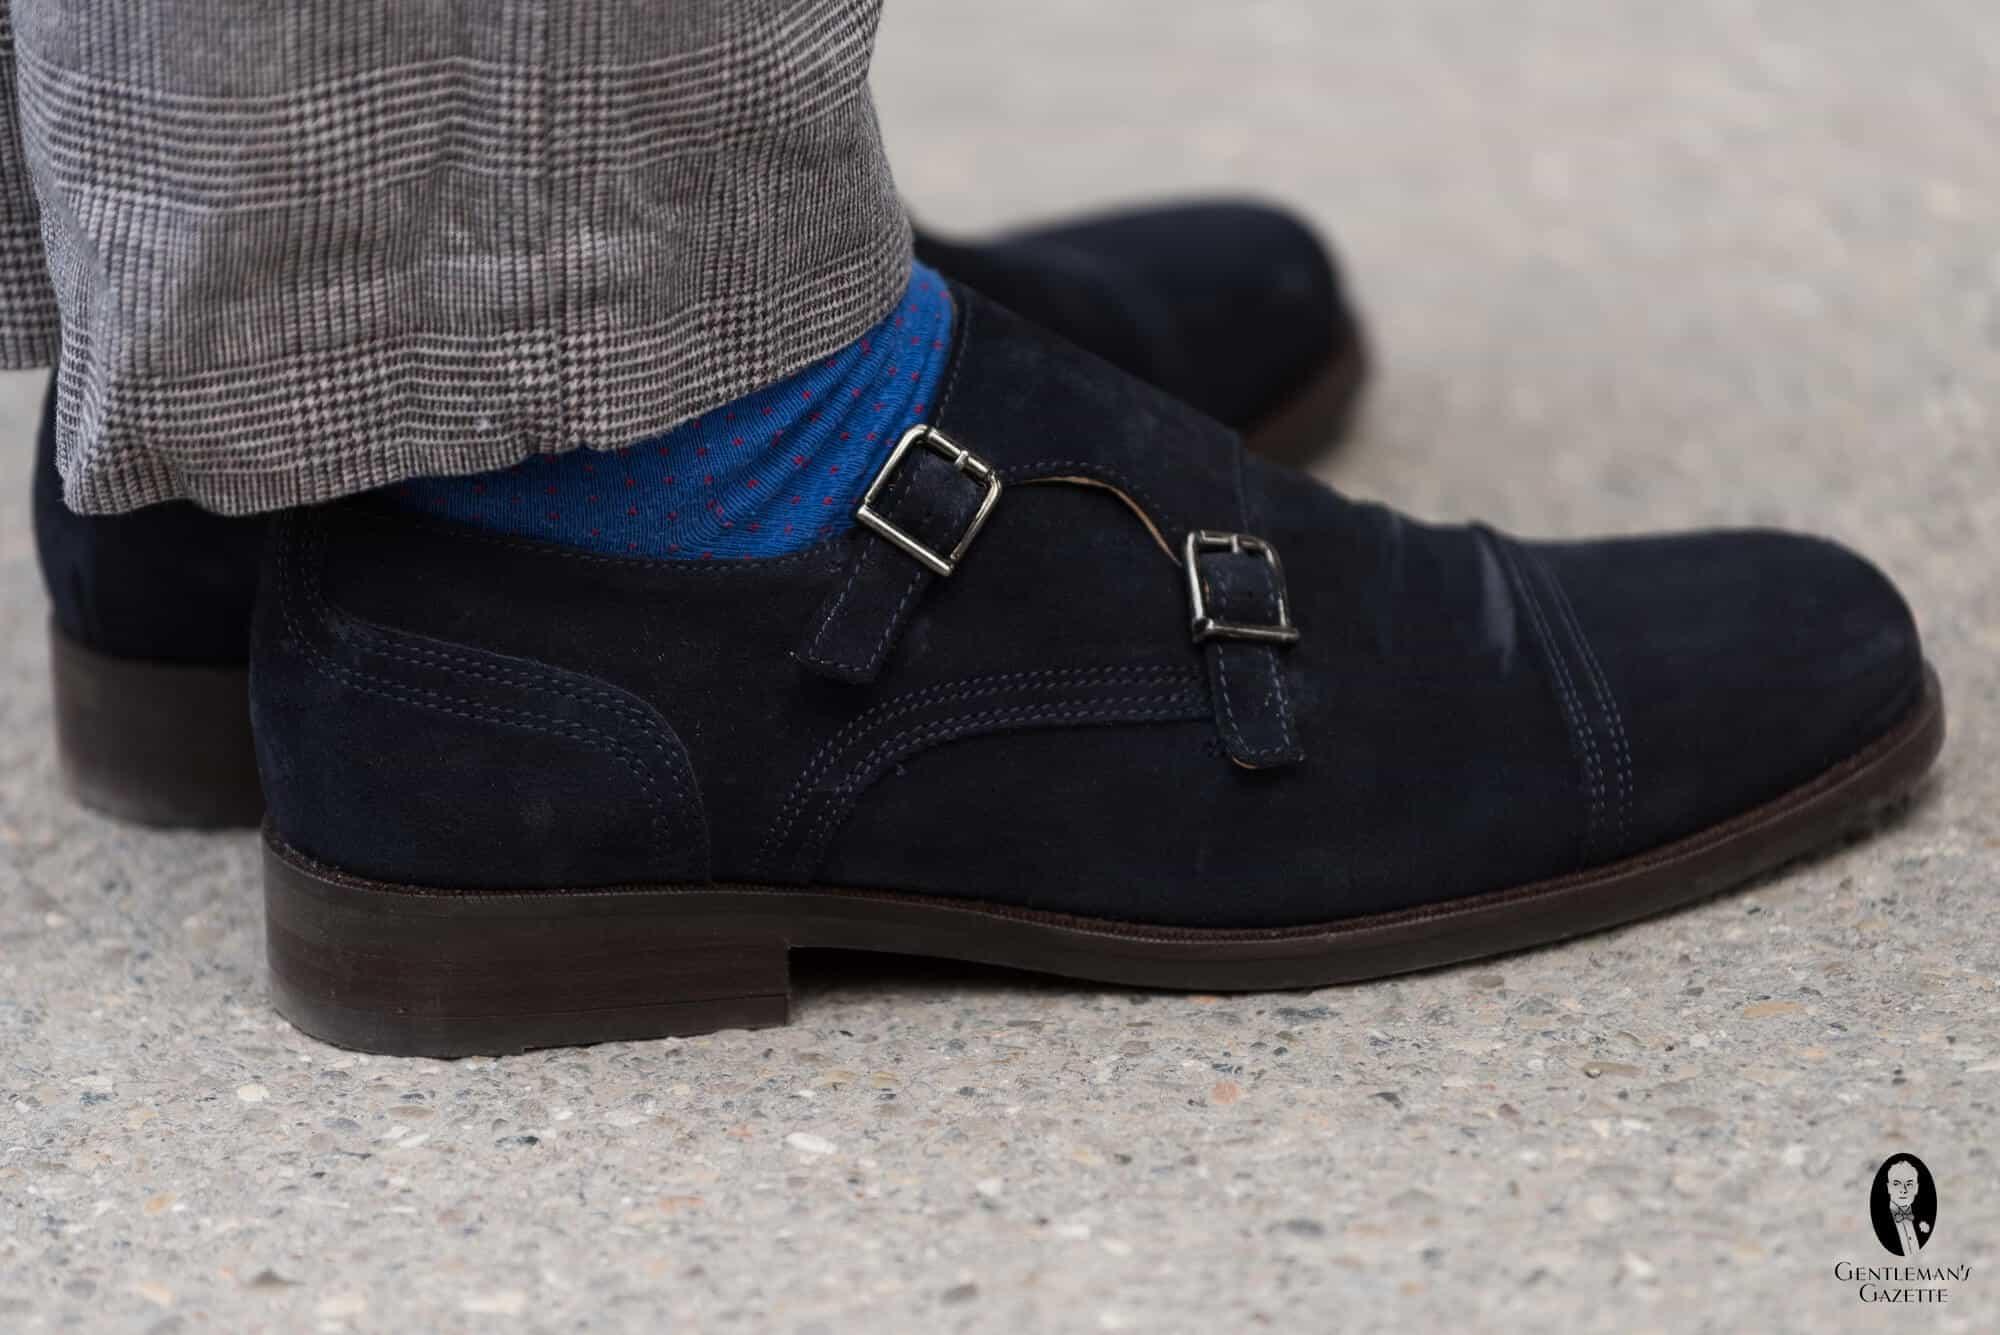 Ermenegildo Zegna Men's New Flex Monk-Strap Shoes, Brown Details Ermenegildo Zegna shoe in calf, lamb, and goat leather. Tapered toe. Single monk strap with silvertone buckle. Comfort rubber outsole. Corthay Arca Suede Double-Monk Shoe, Navy Details Maison Corthay shoe in suede with contrast edges. Tapered plain toe. Double monk straps with.